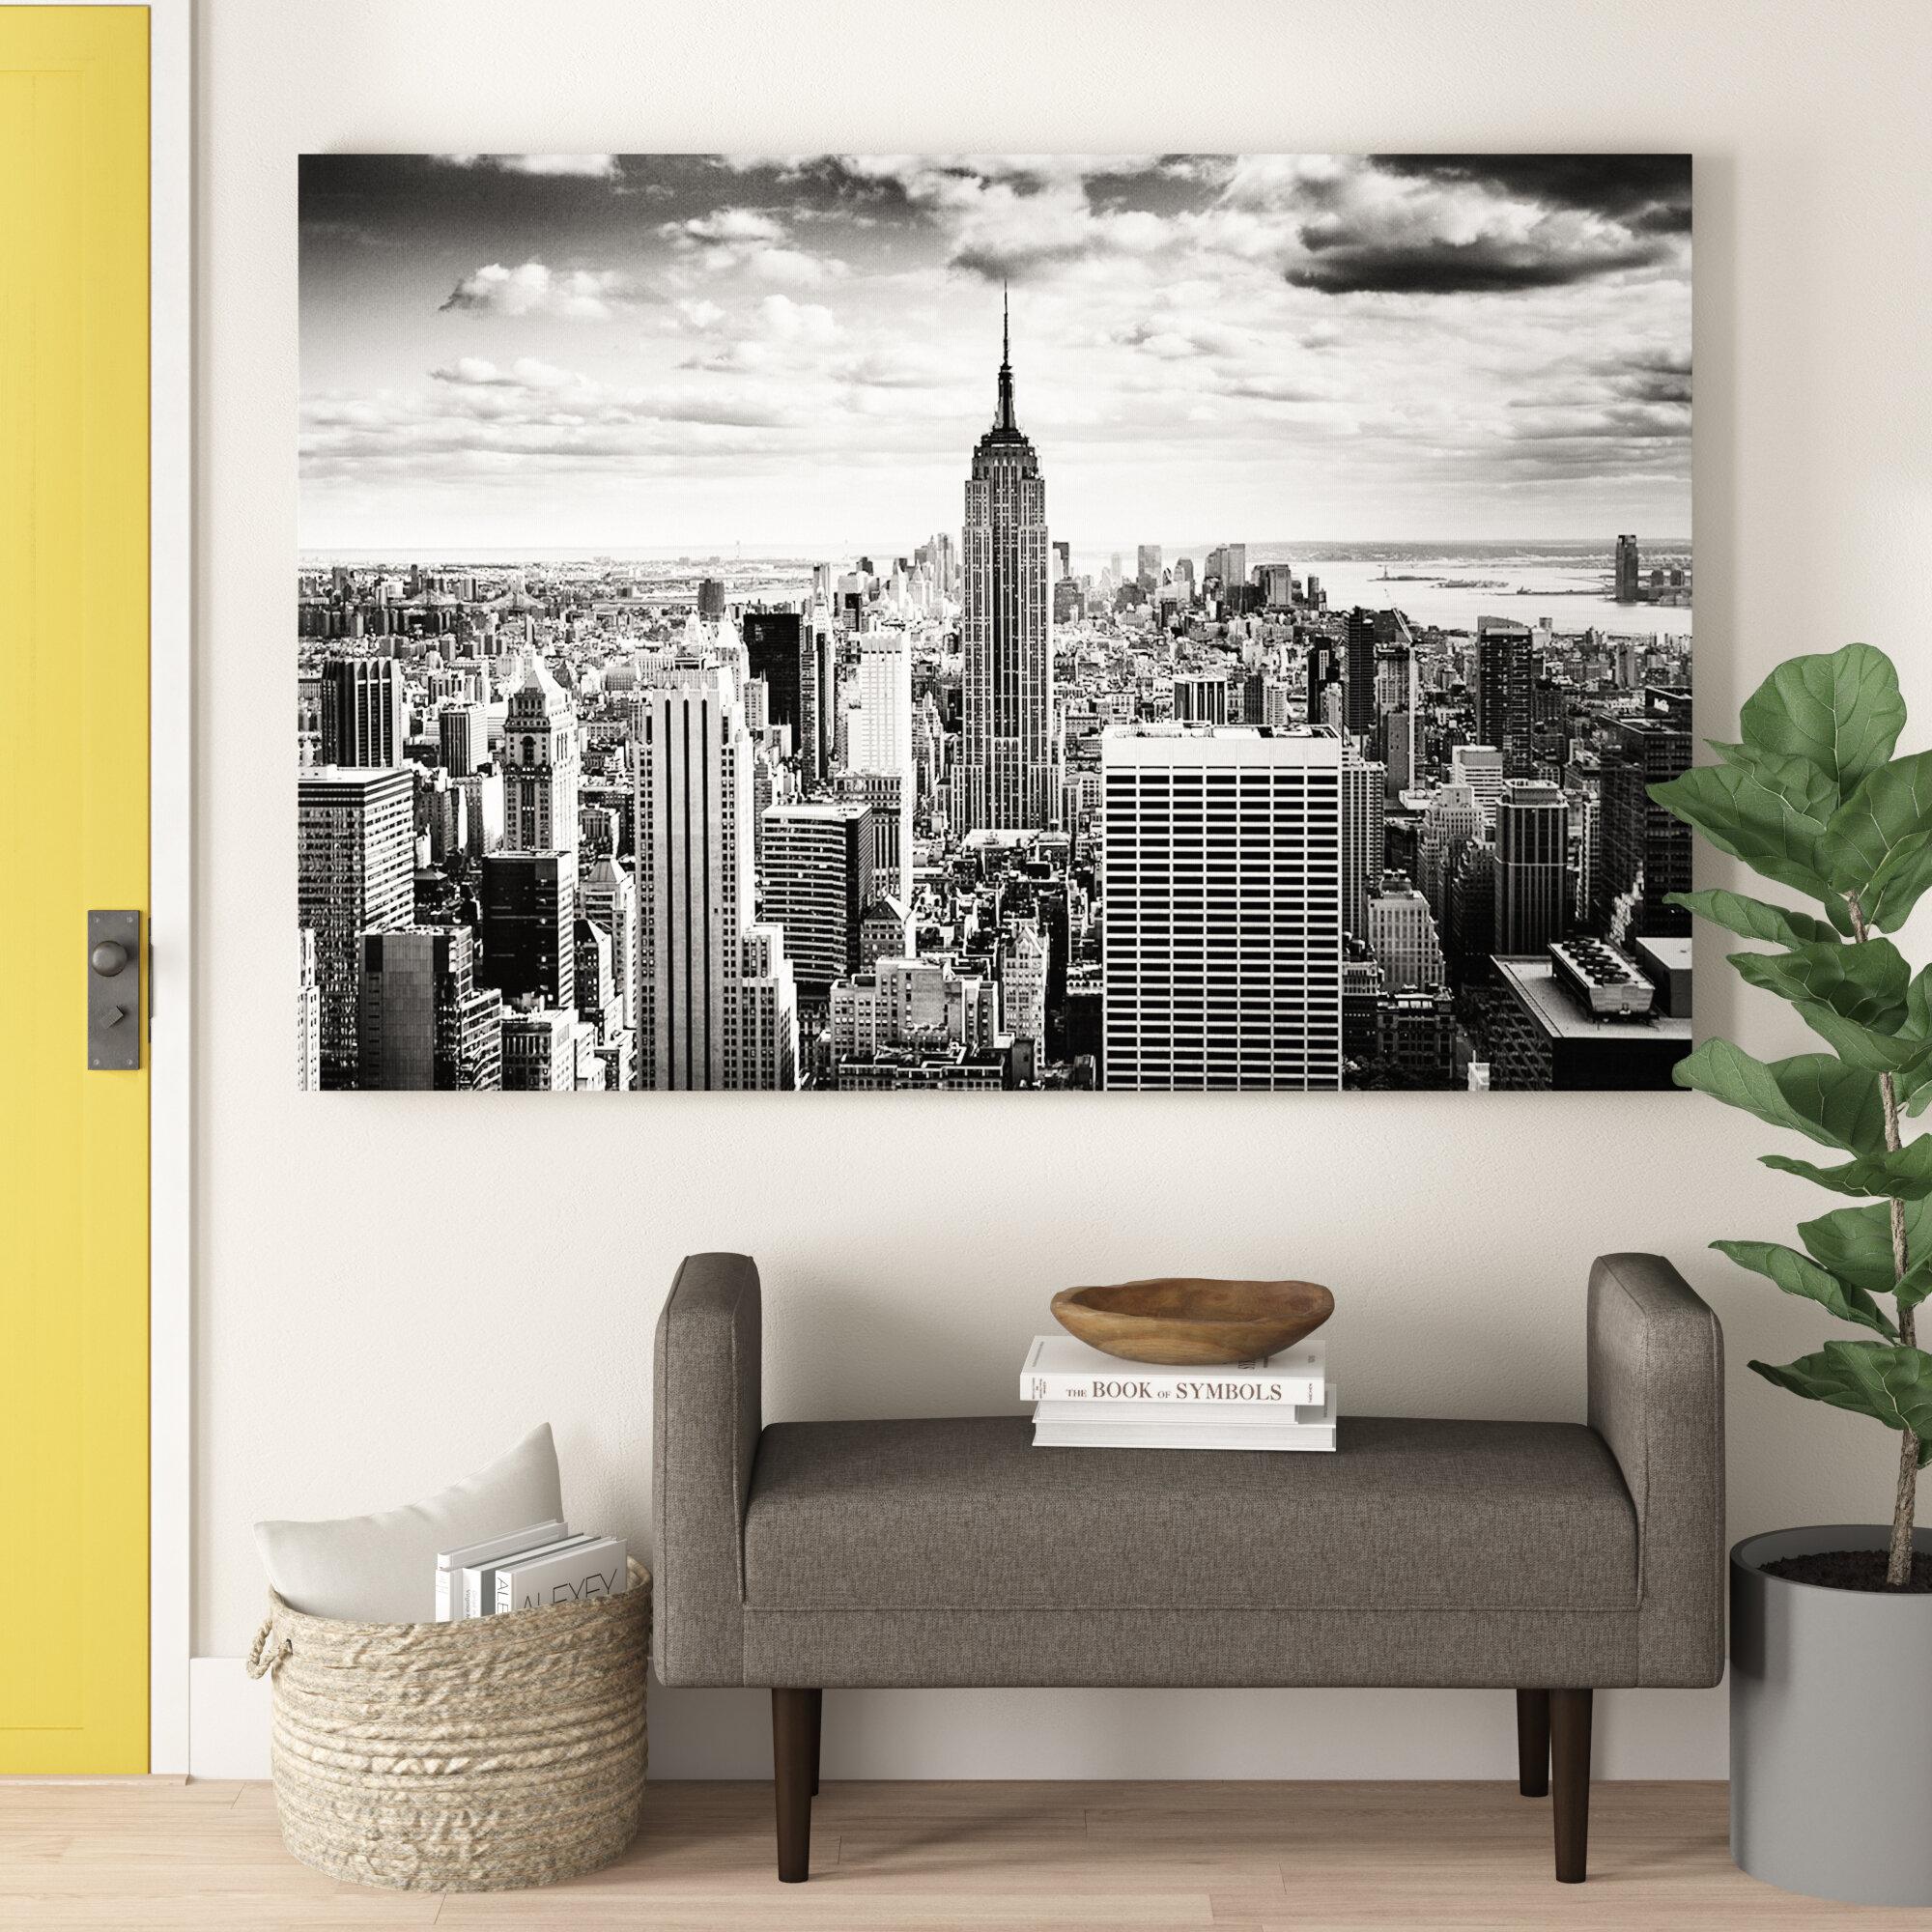 urban wall art Rockefeller Center New York print New York poster modern home decor New York black and white photography prints